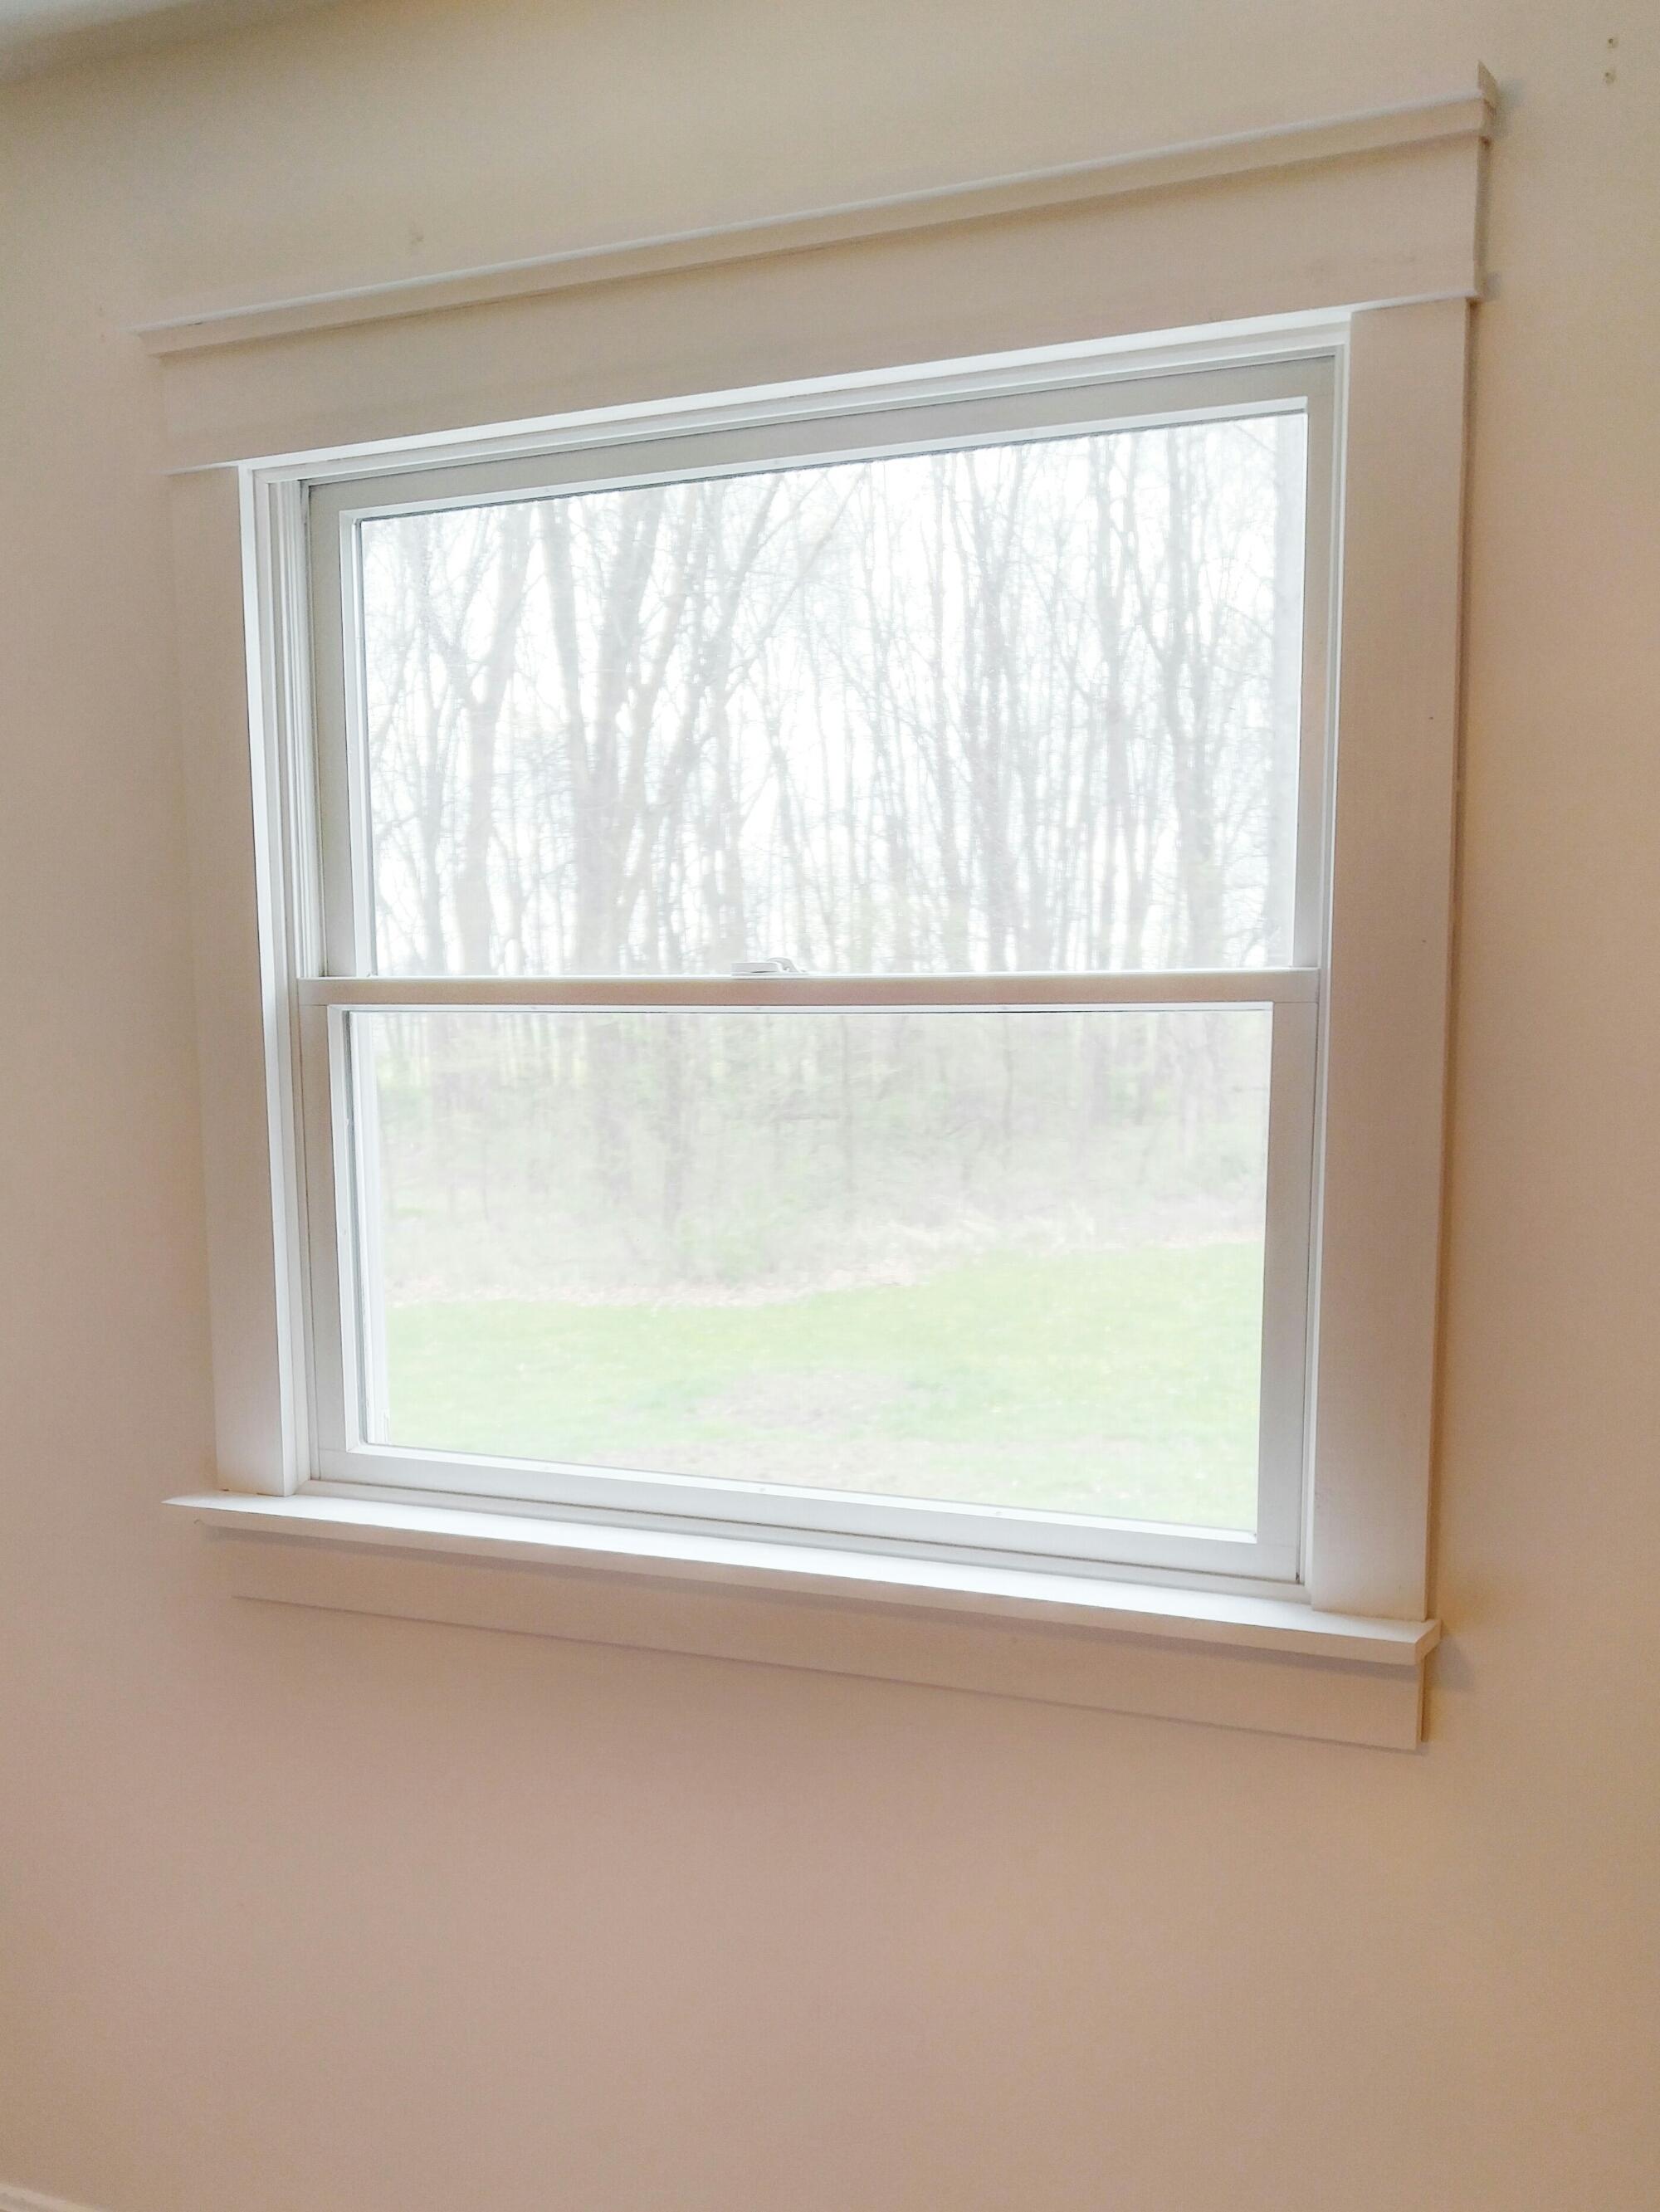 Diy interior window trim - Image Diy Farmhouse Window Trim